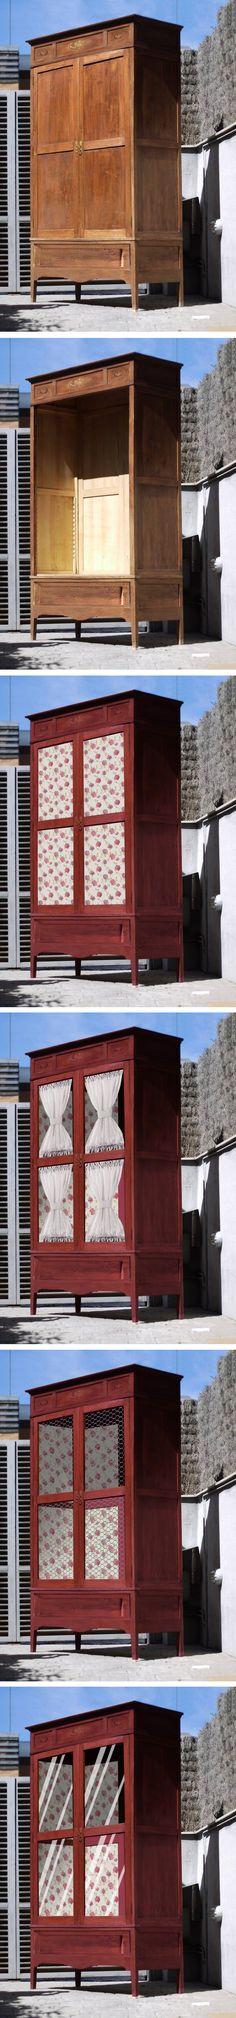 Ideas para un armario ropero.